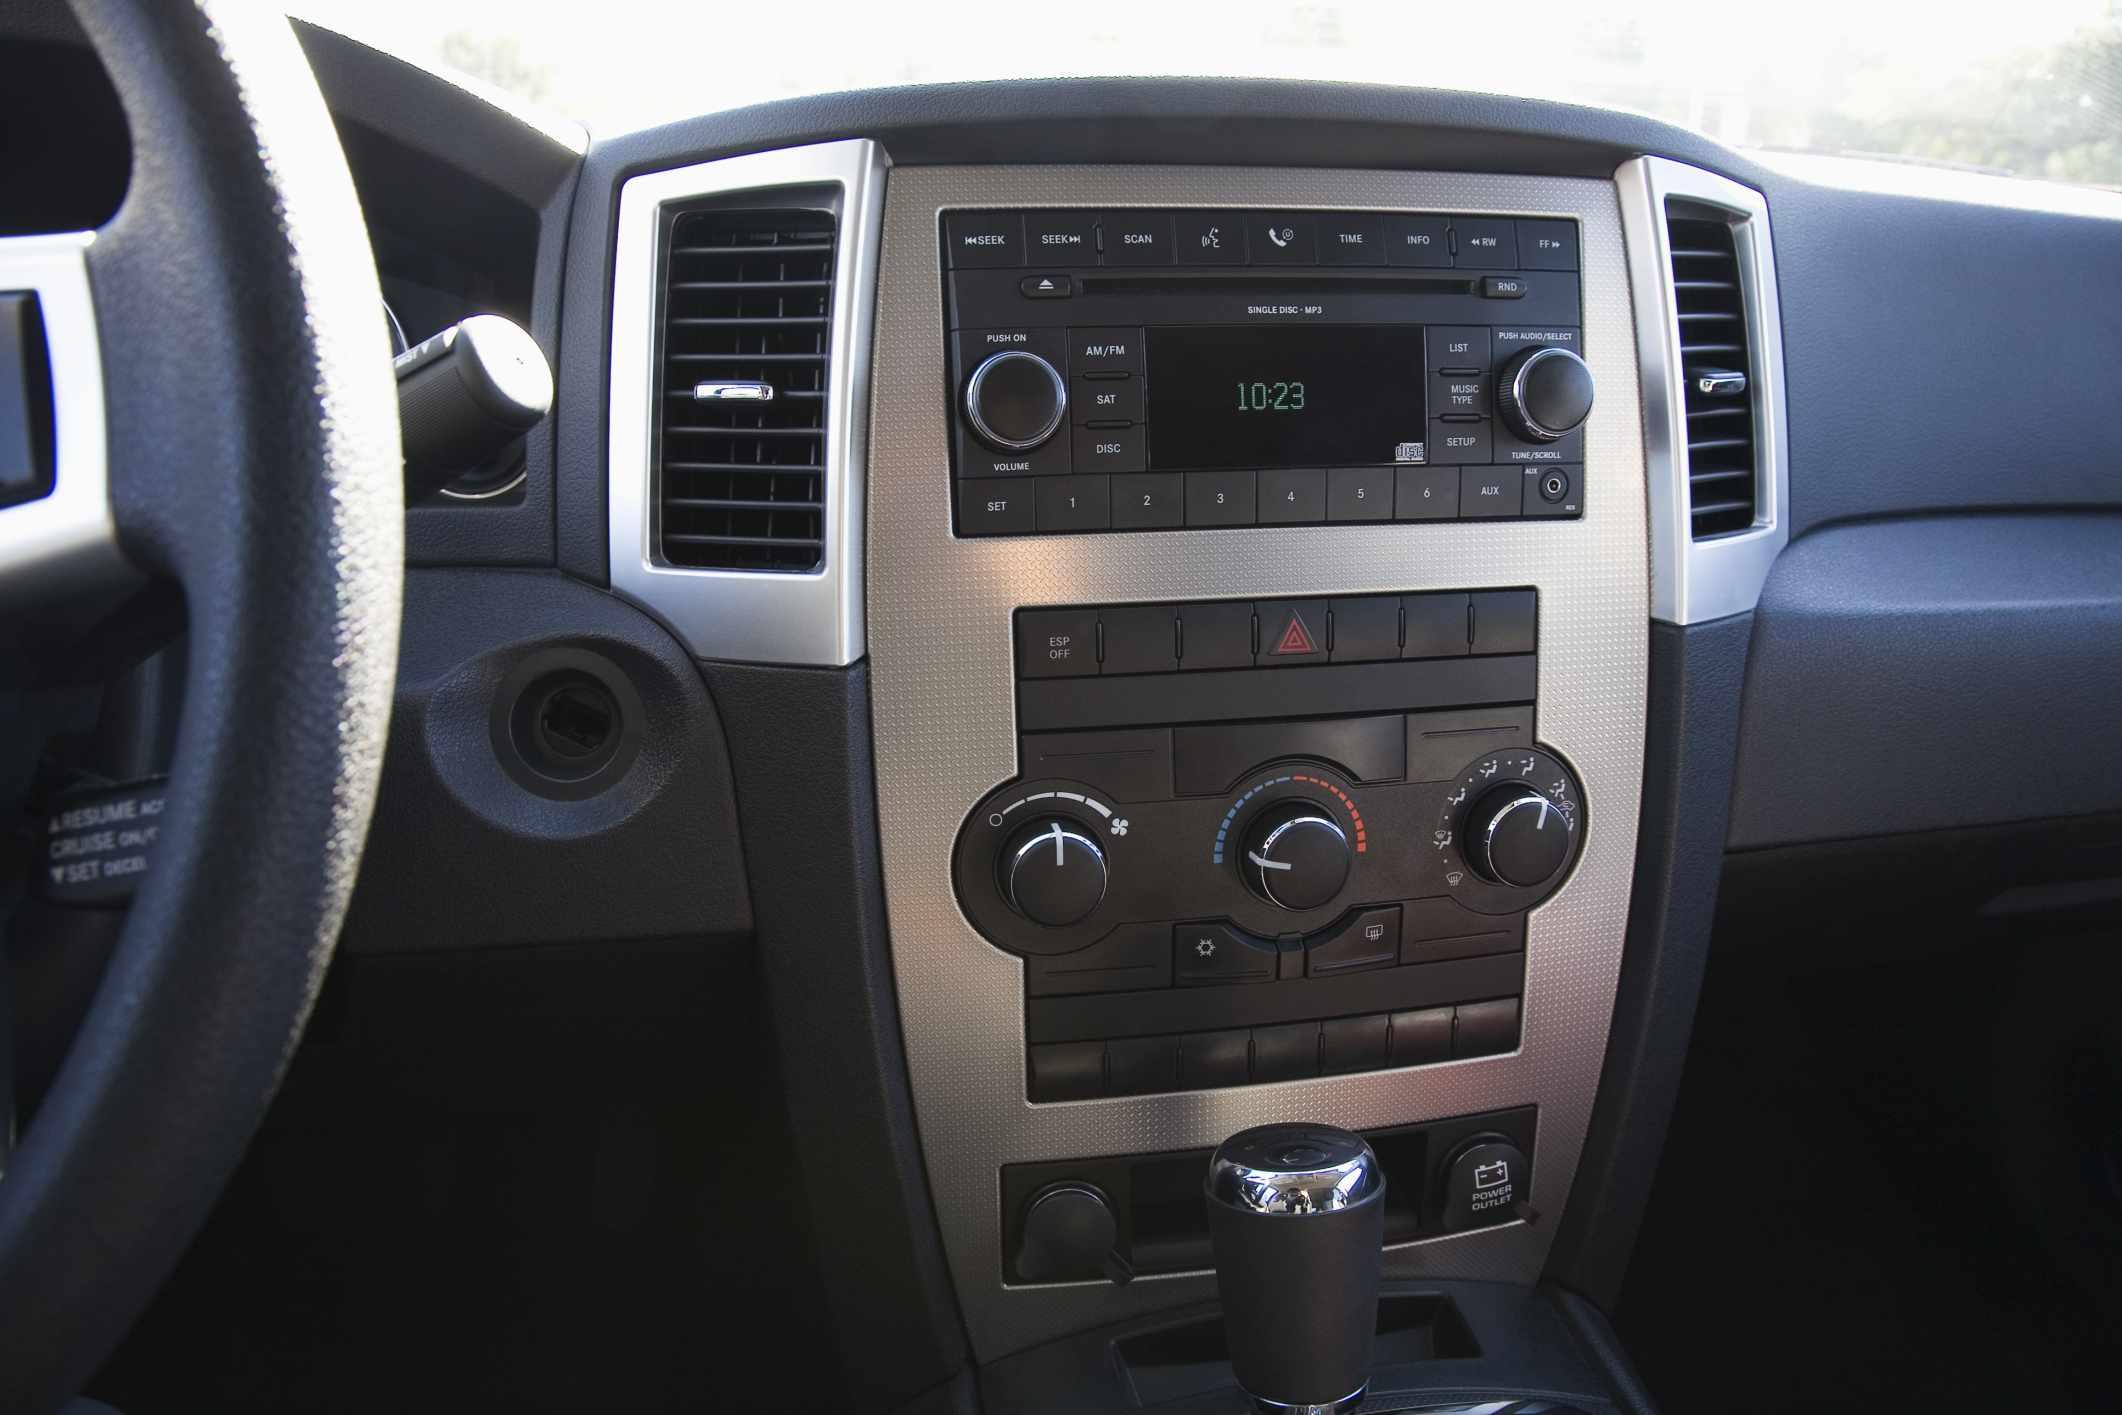 Cigarette lighter sockets in a car dashboard.